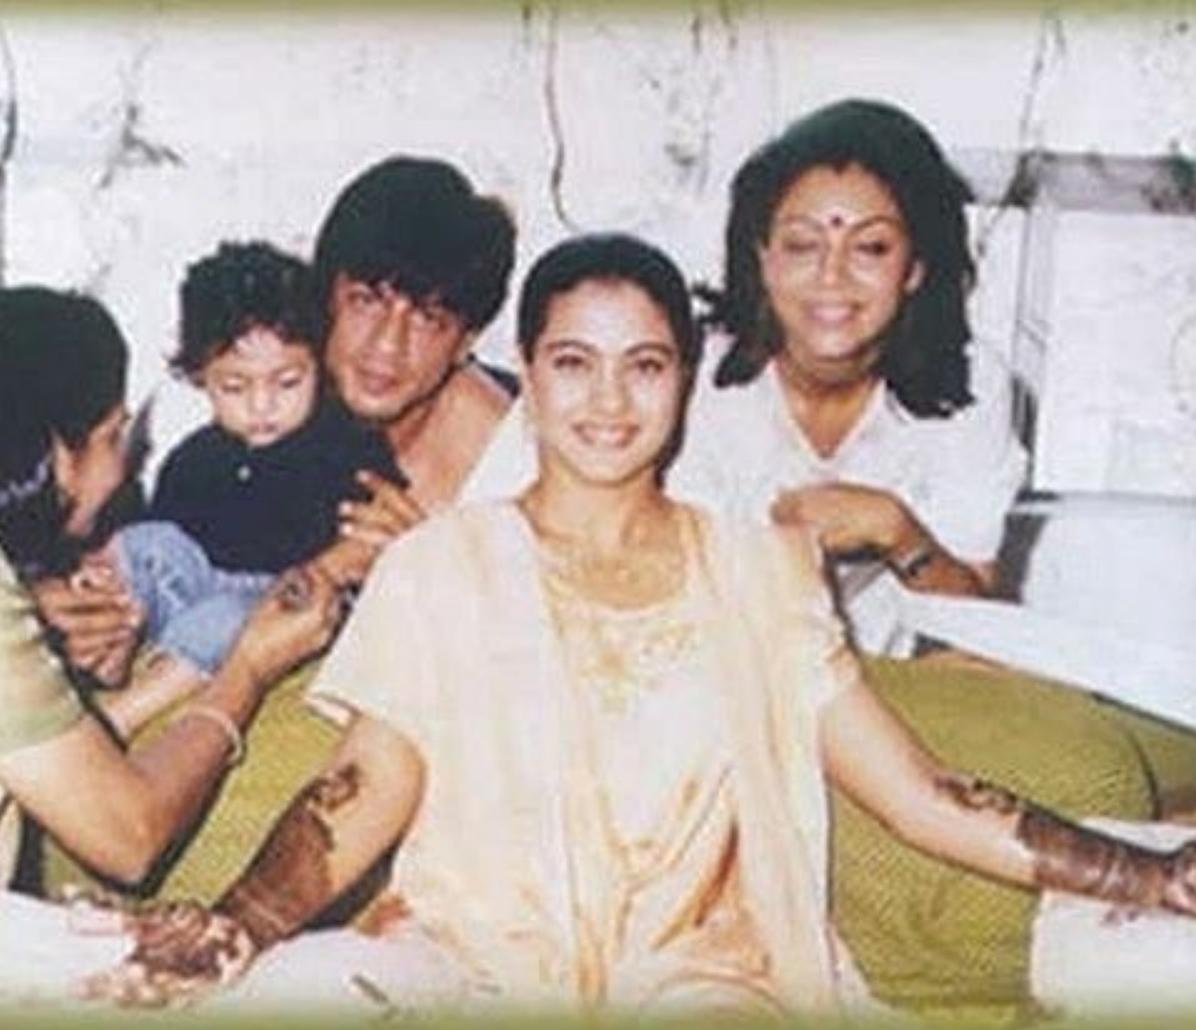 Vintage photo of Shah Rukh Khan and Gauri Khan at Kajol and Ajay Devgn's wedding